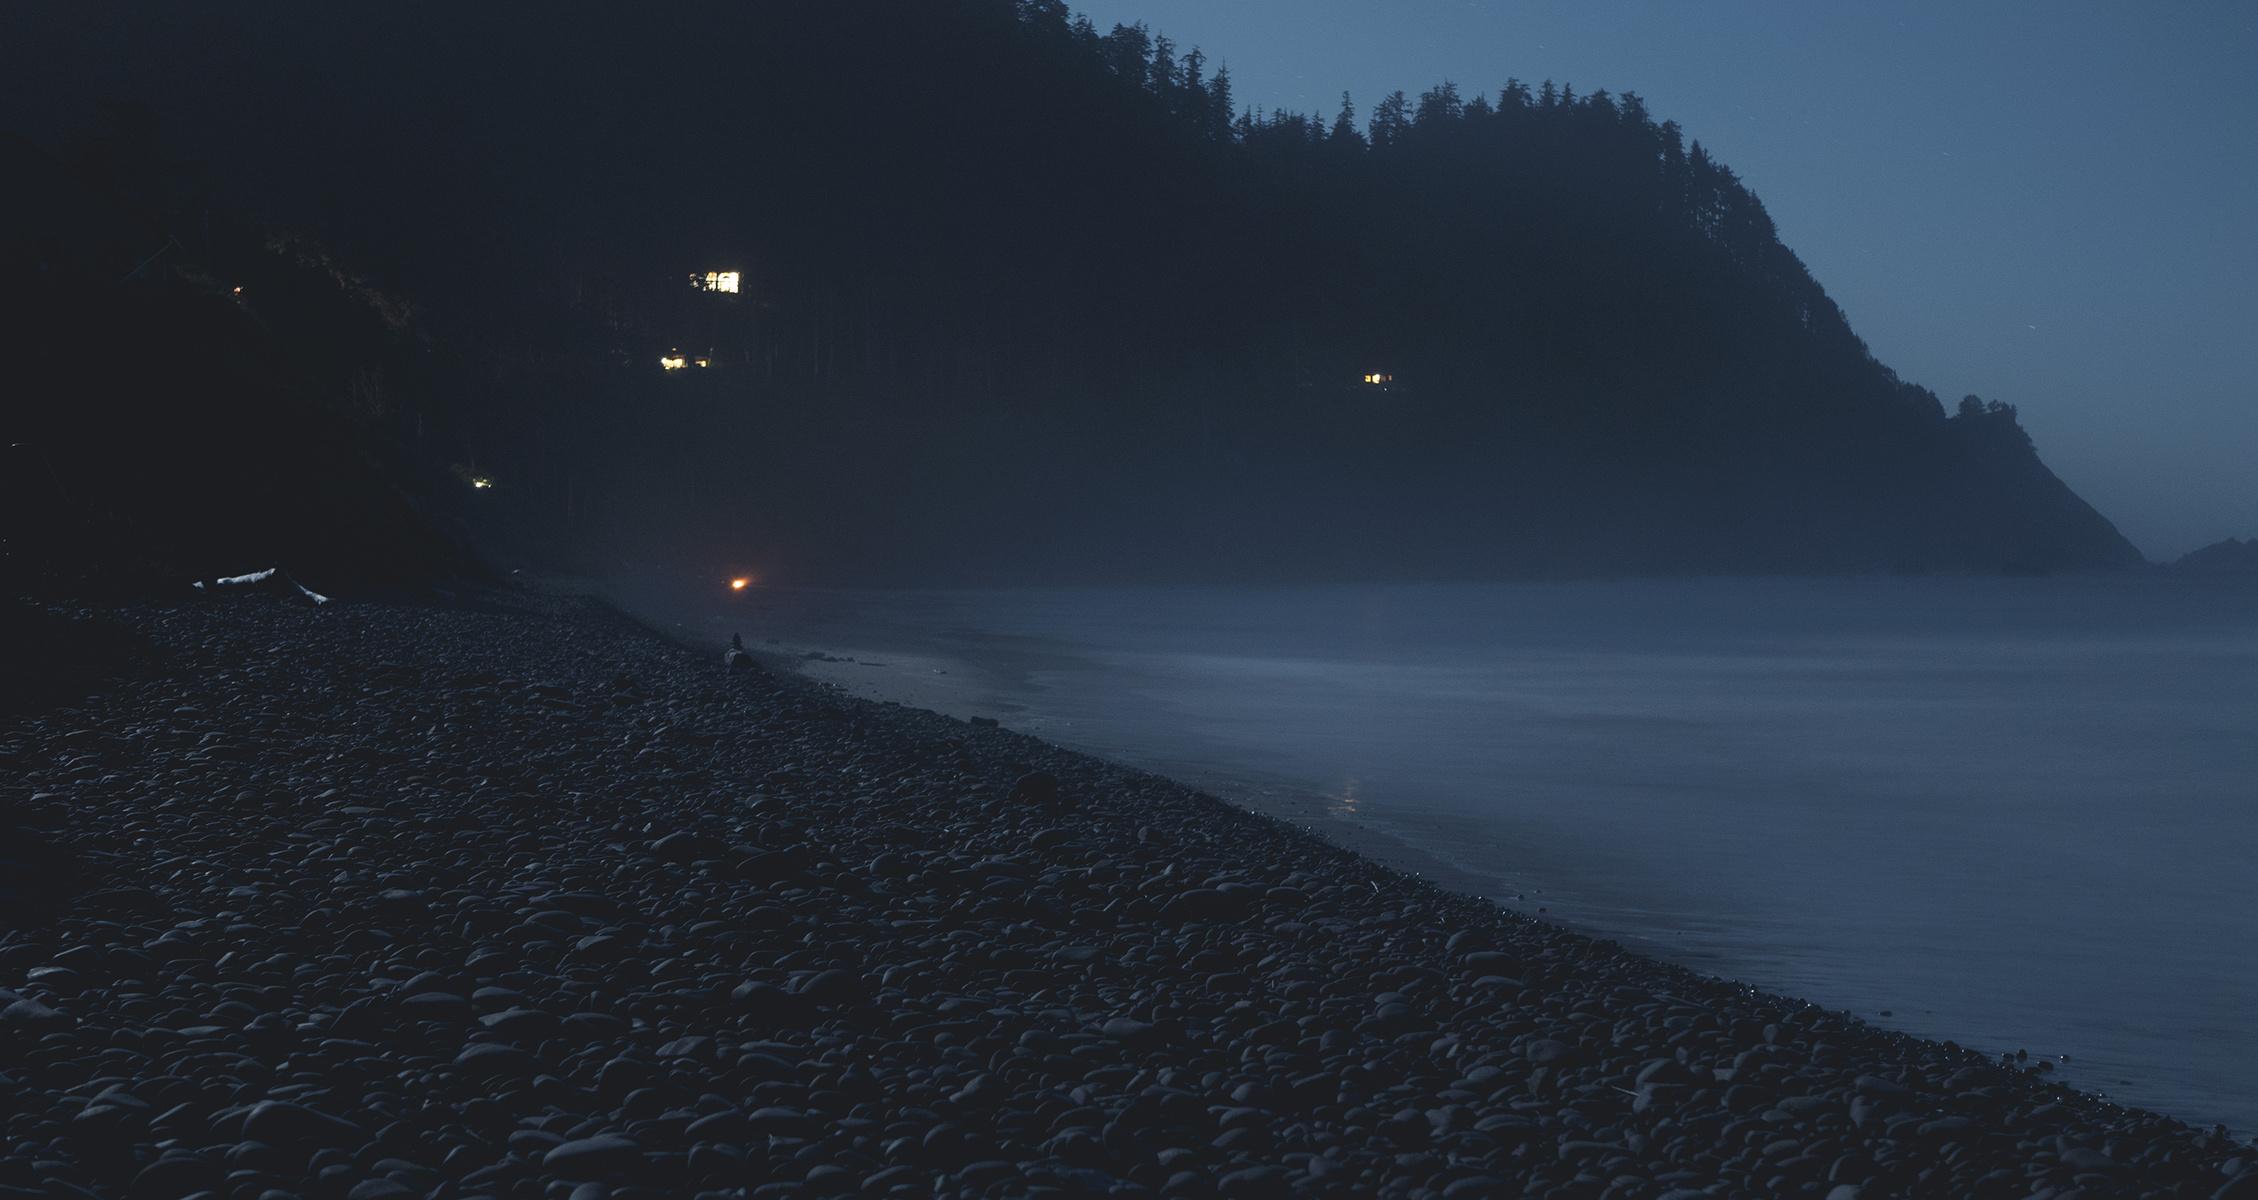 nightfall on the beach